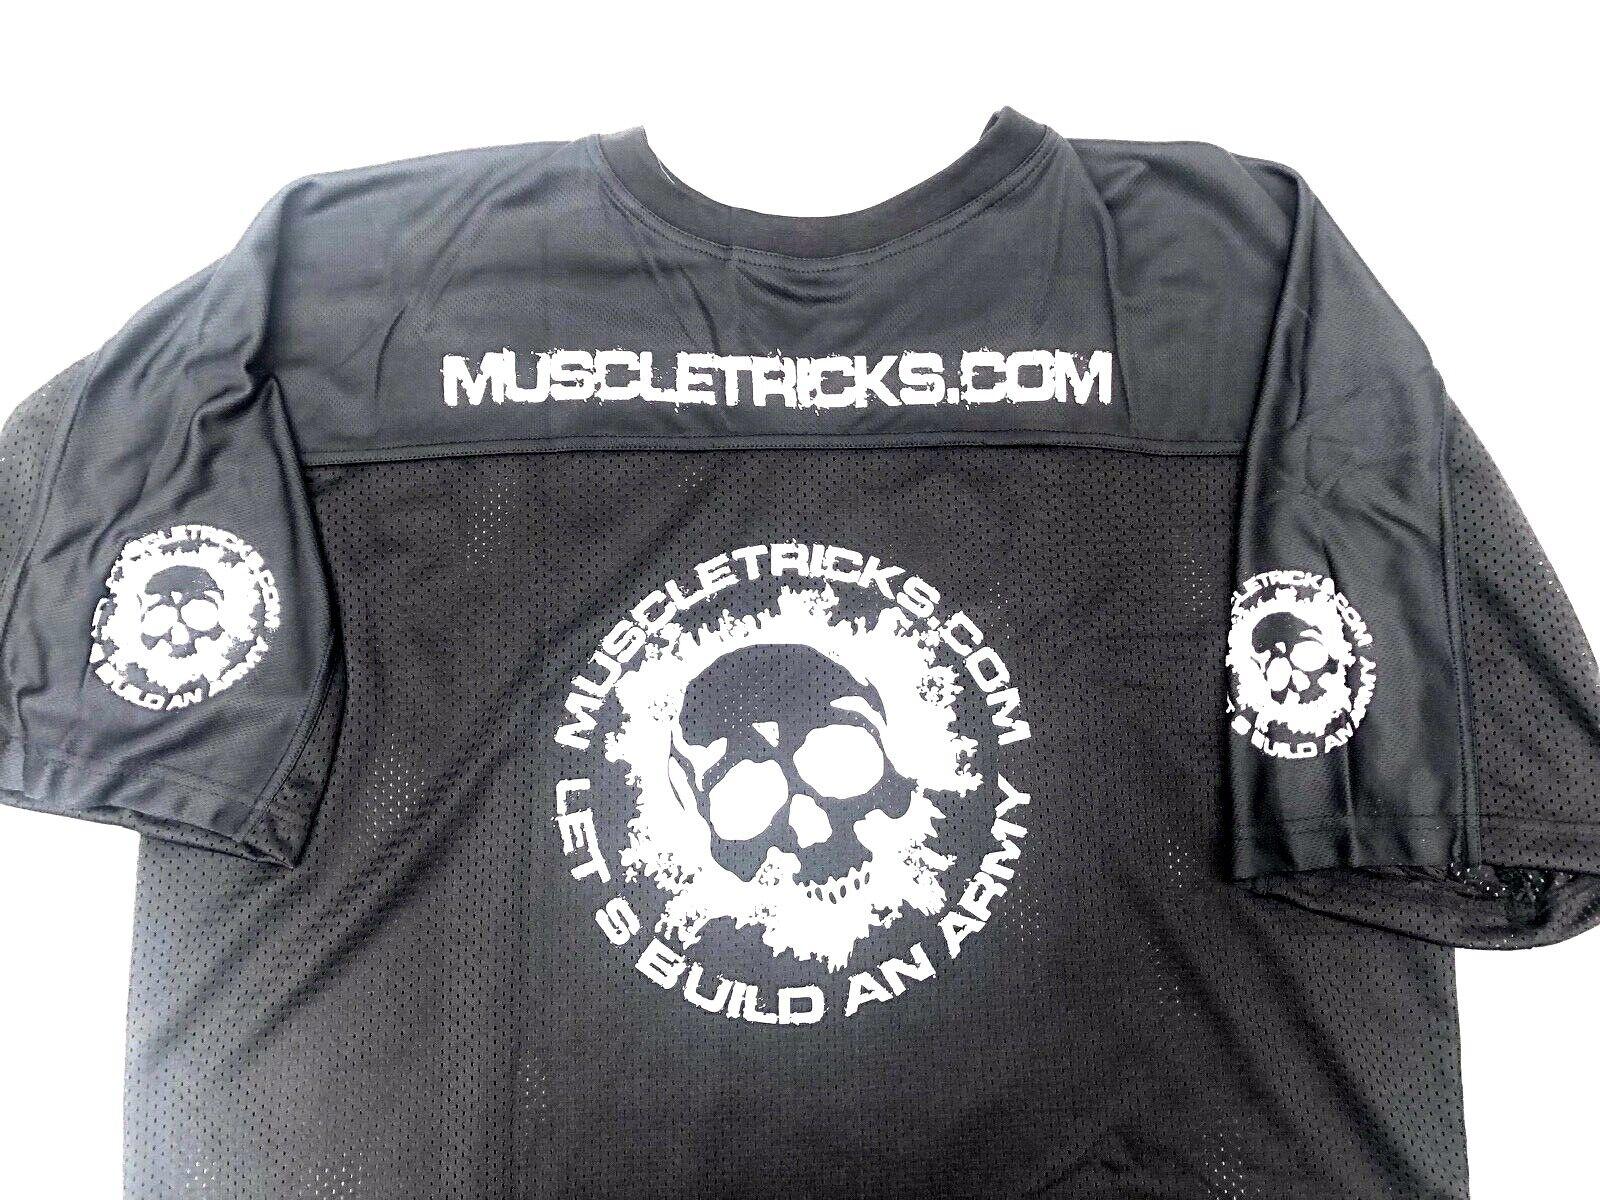 Shredz Bodybuilding clothing Gym  2 x Bodybuilding rag top Black and Navy